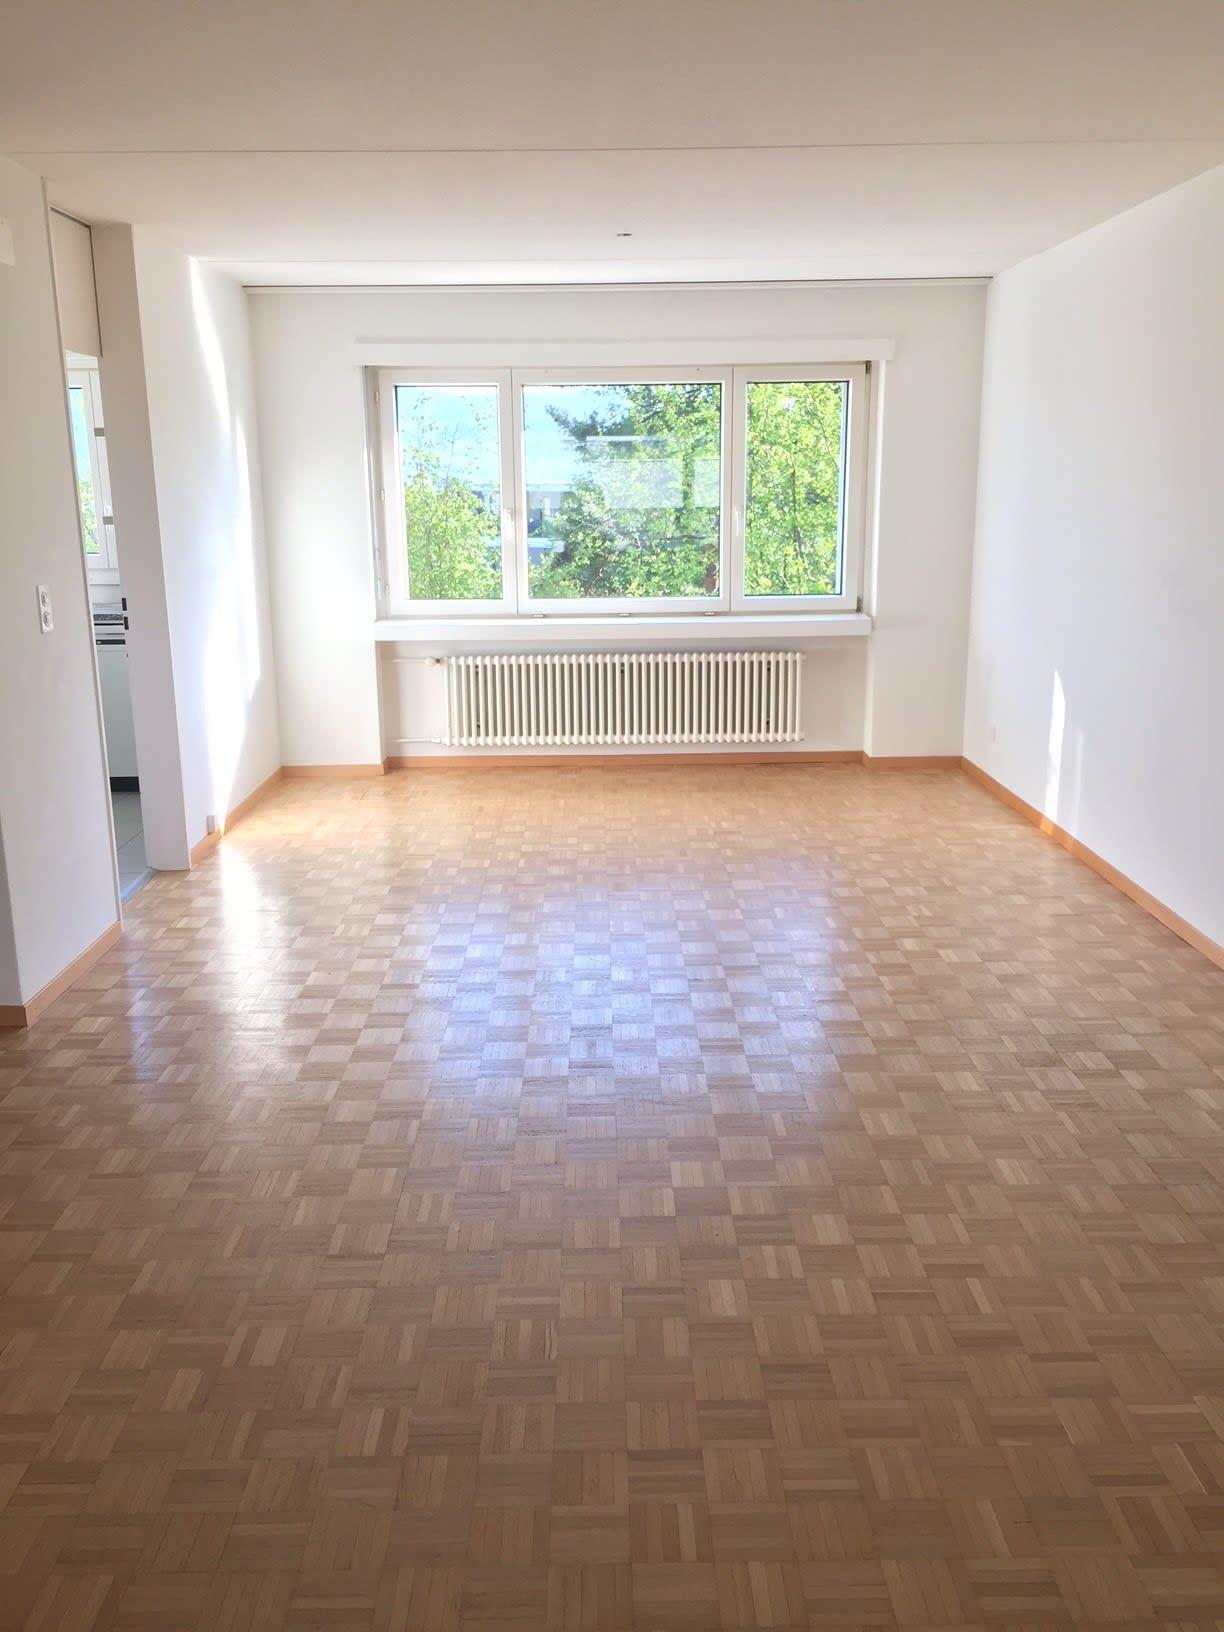 General-Werdmüller-Strasse 7